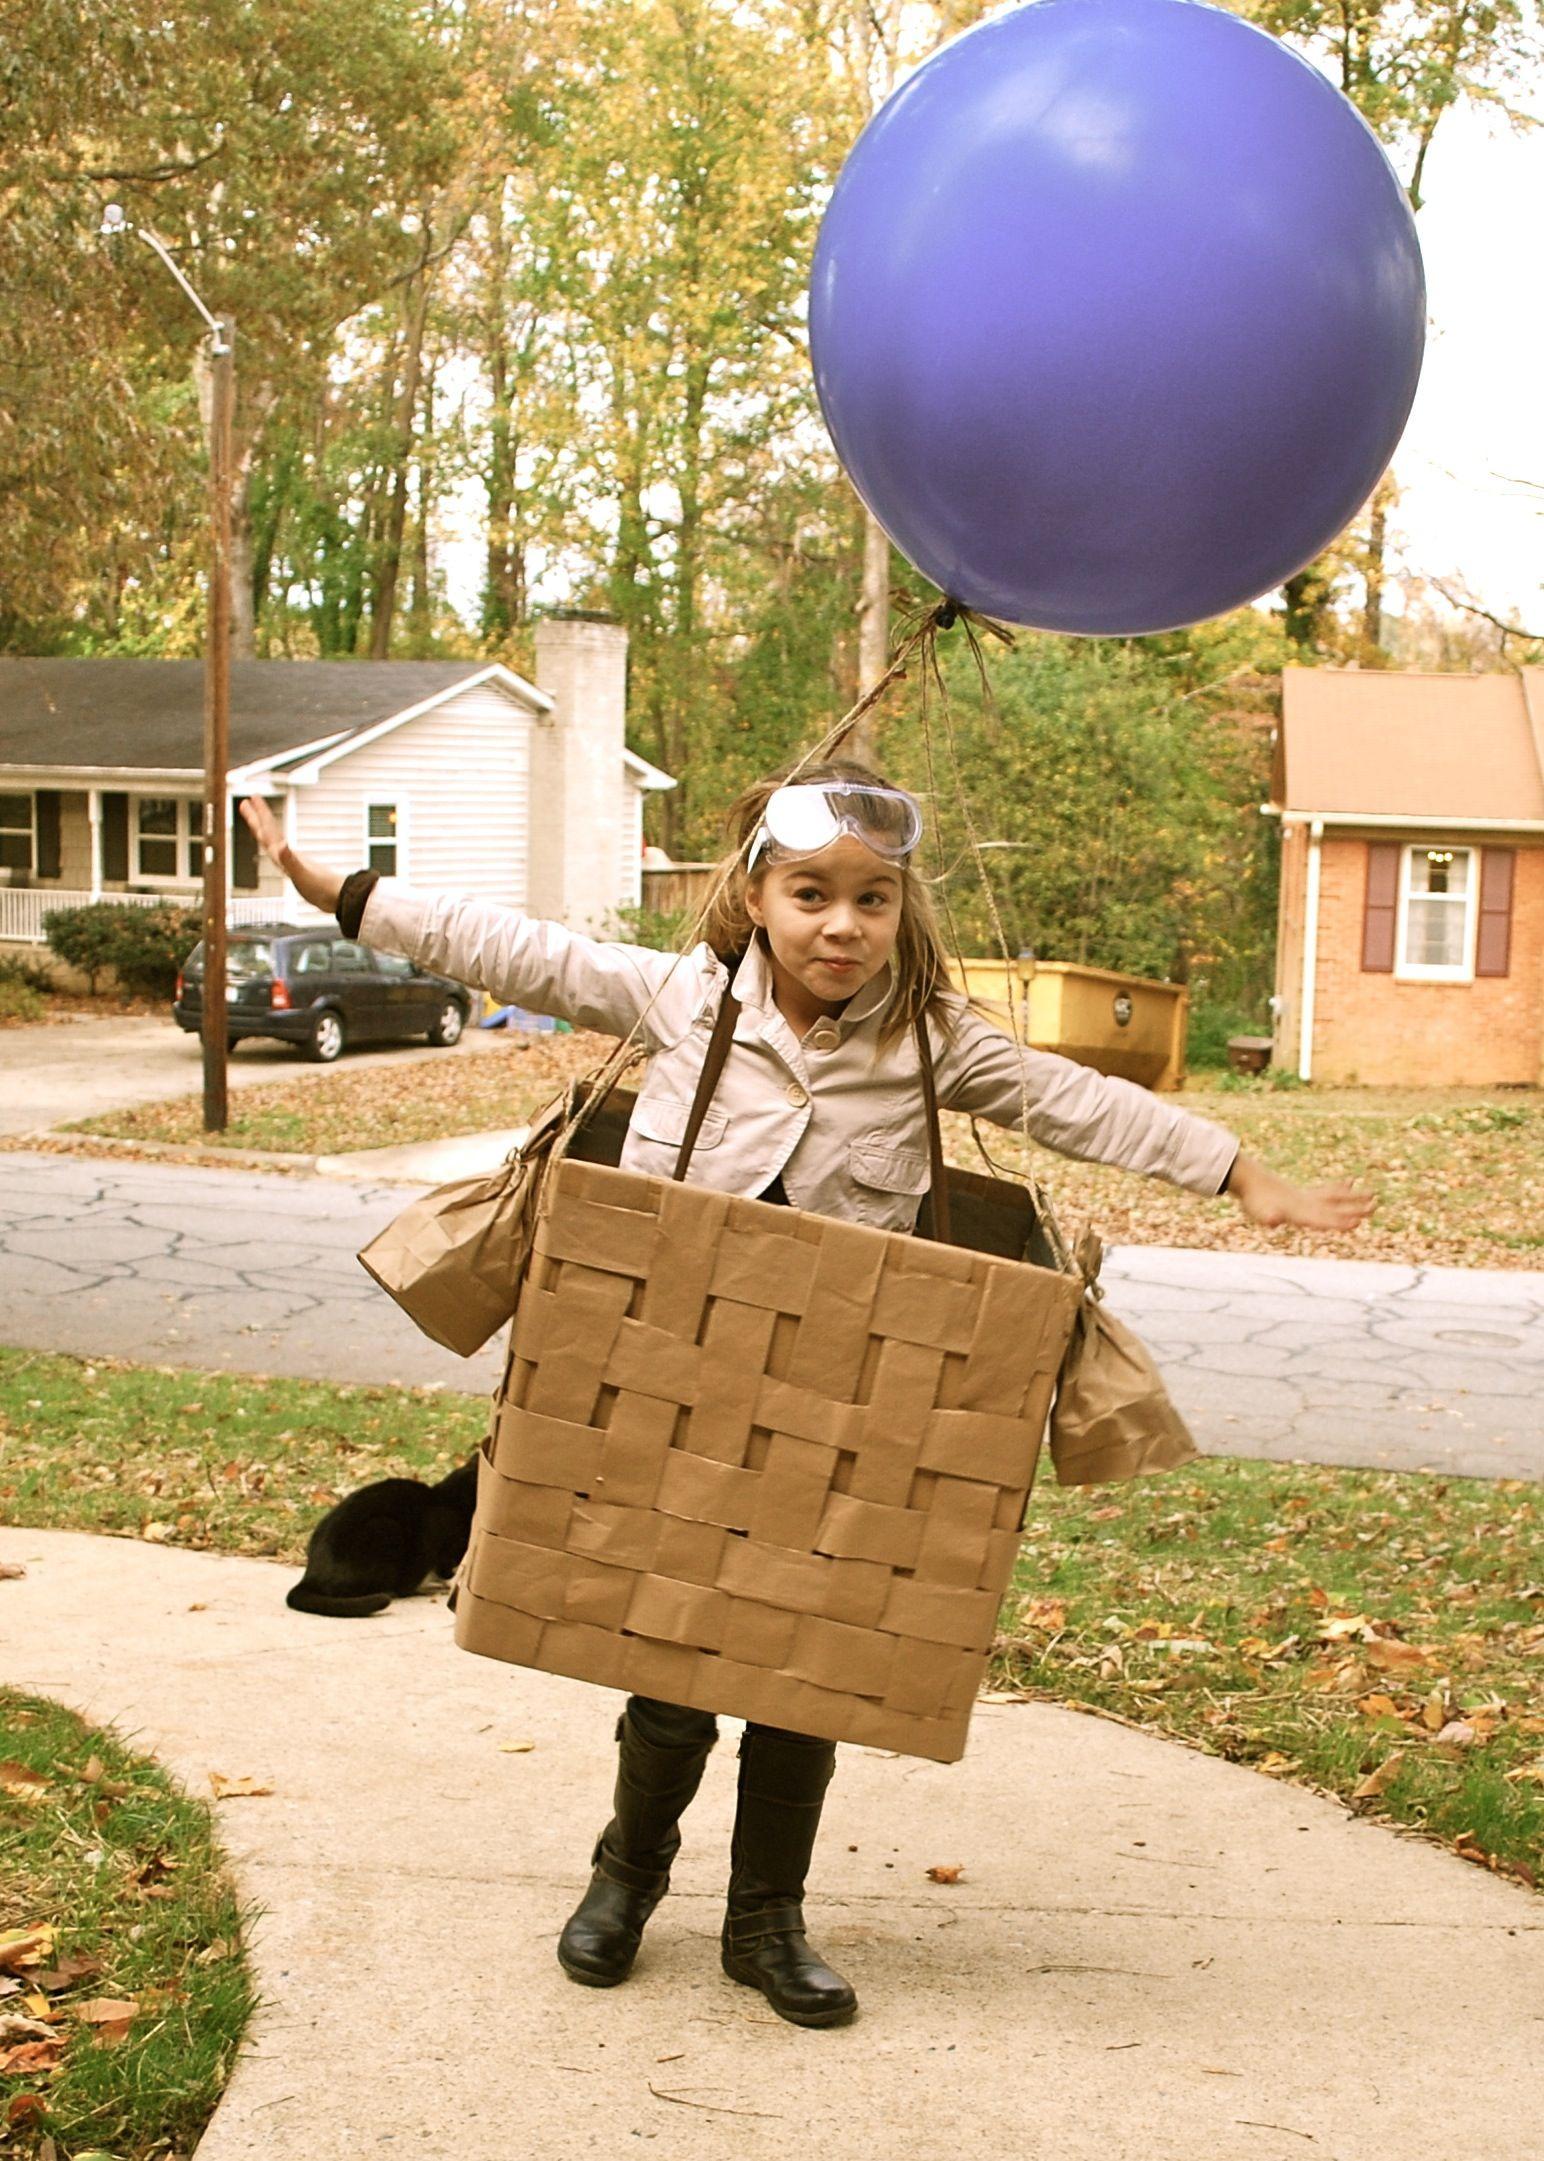 Hot air balloon pilot DIY costume. Weave kraft paper